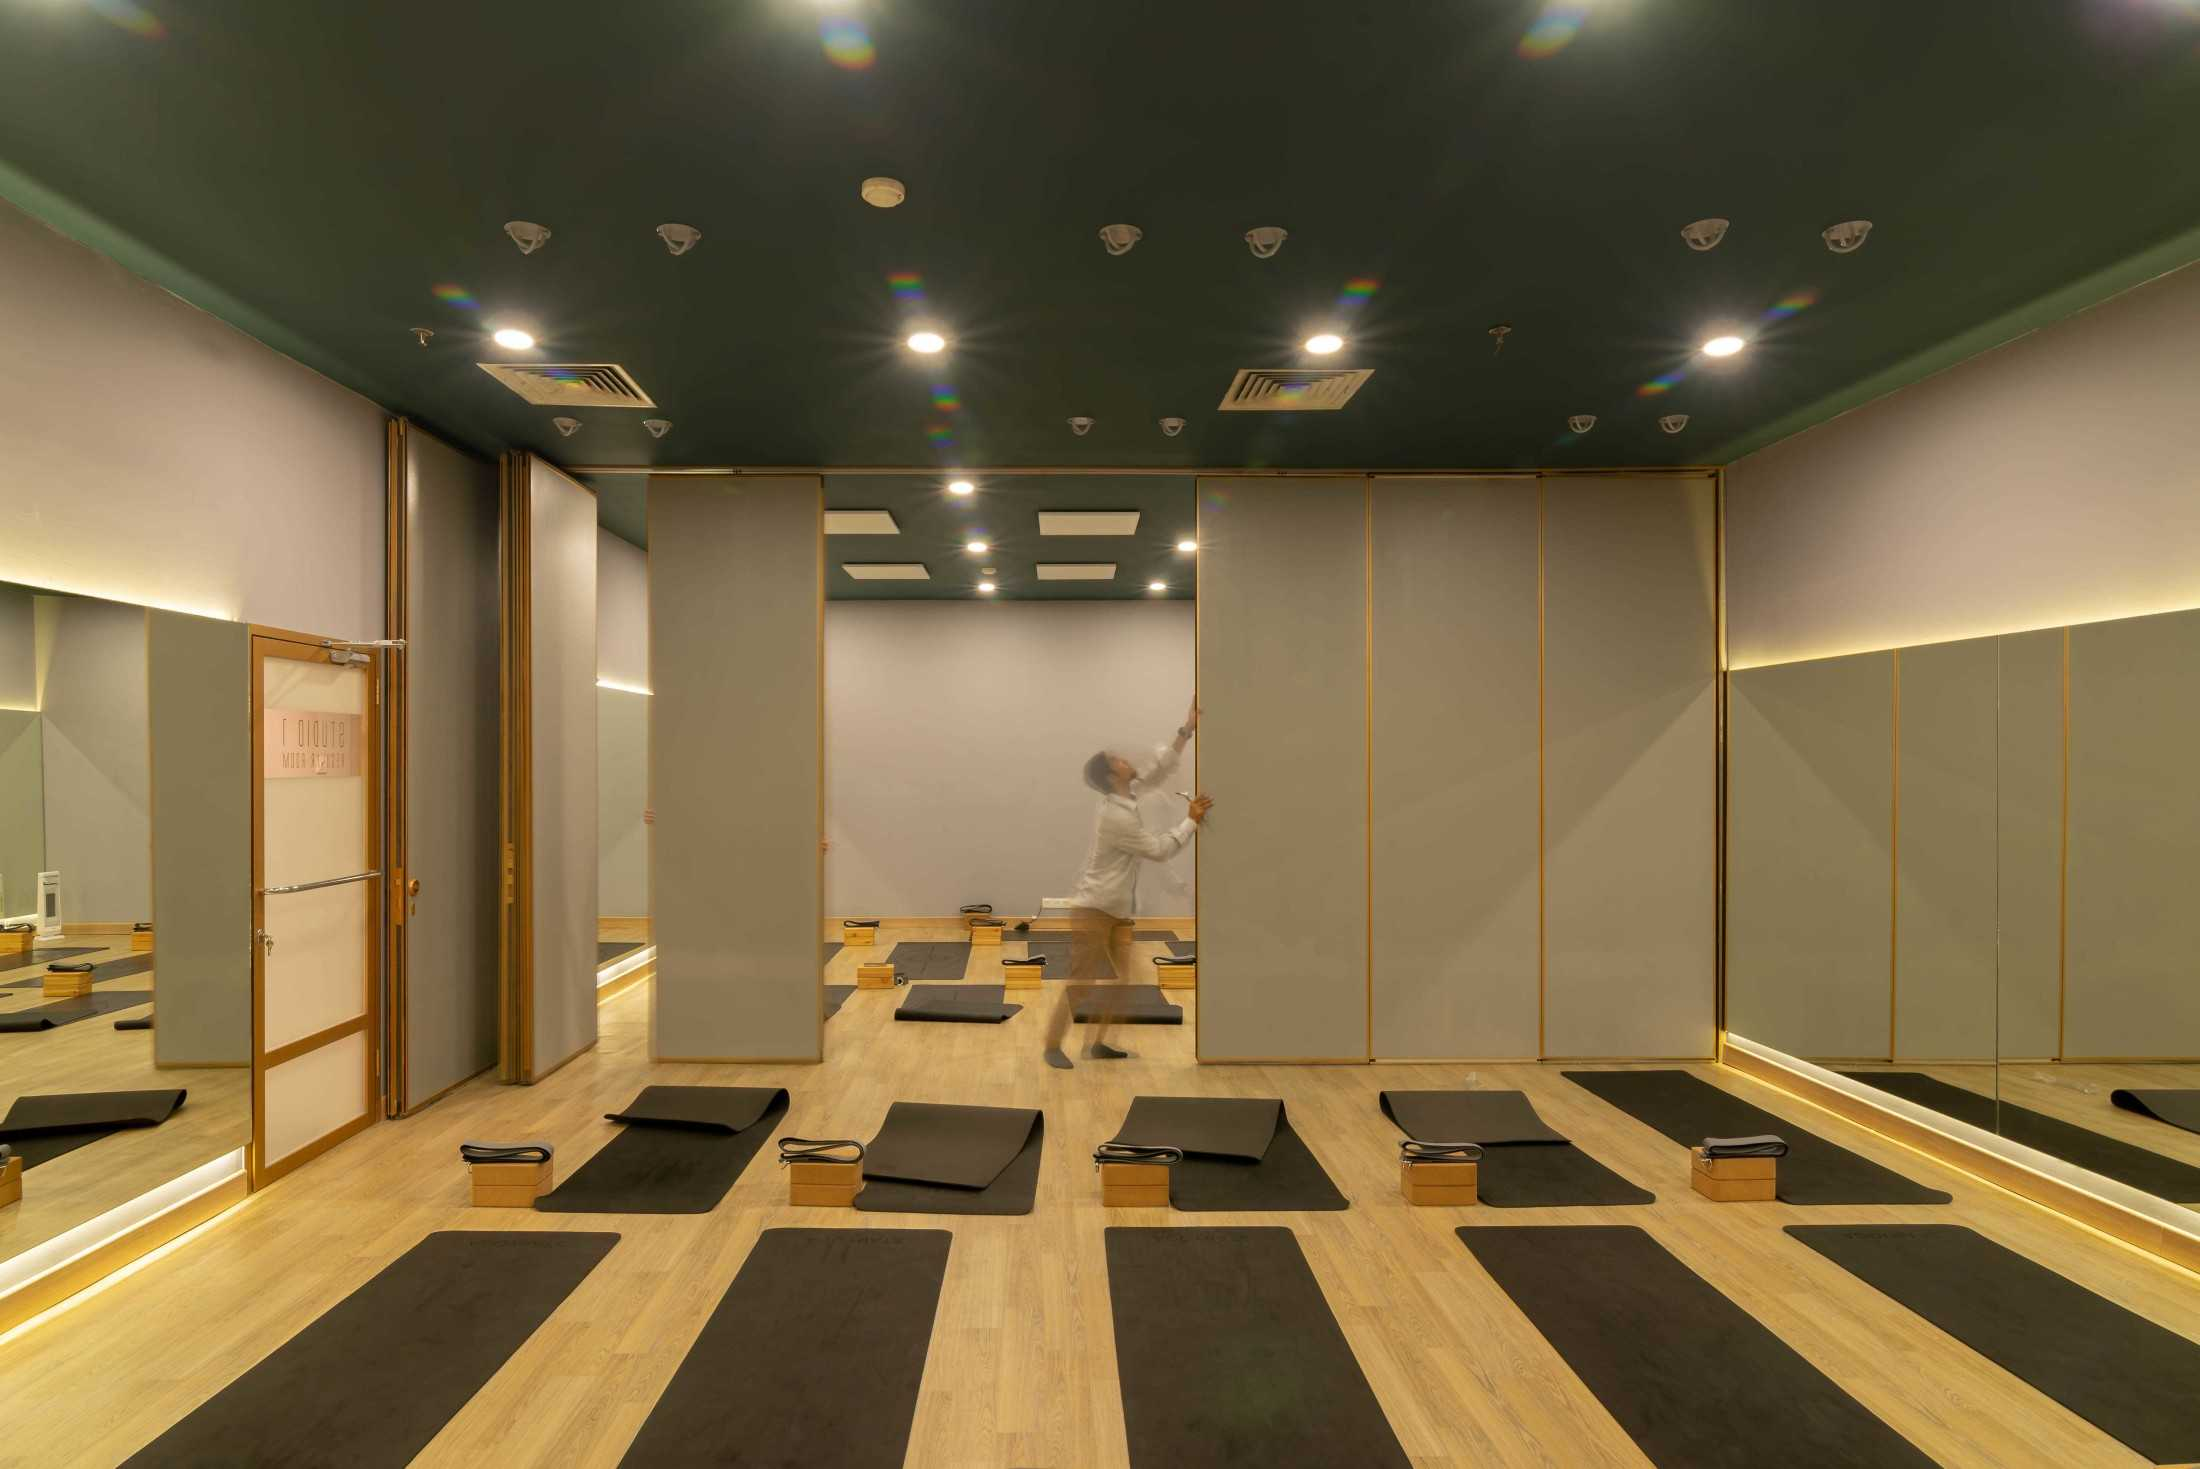 Archid Design&build Star Yoga Kec. Klp. Gading, Kota Jkt Utara, Daerah Khusus Ibukota Jakarta, Indonesia Kec. Klp. Gading, Kota Jkt Utara, Daerah Khusus Ibukota Jakarta, Indonesia Archid-Design-Build-Star-Yoga  88012